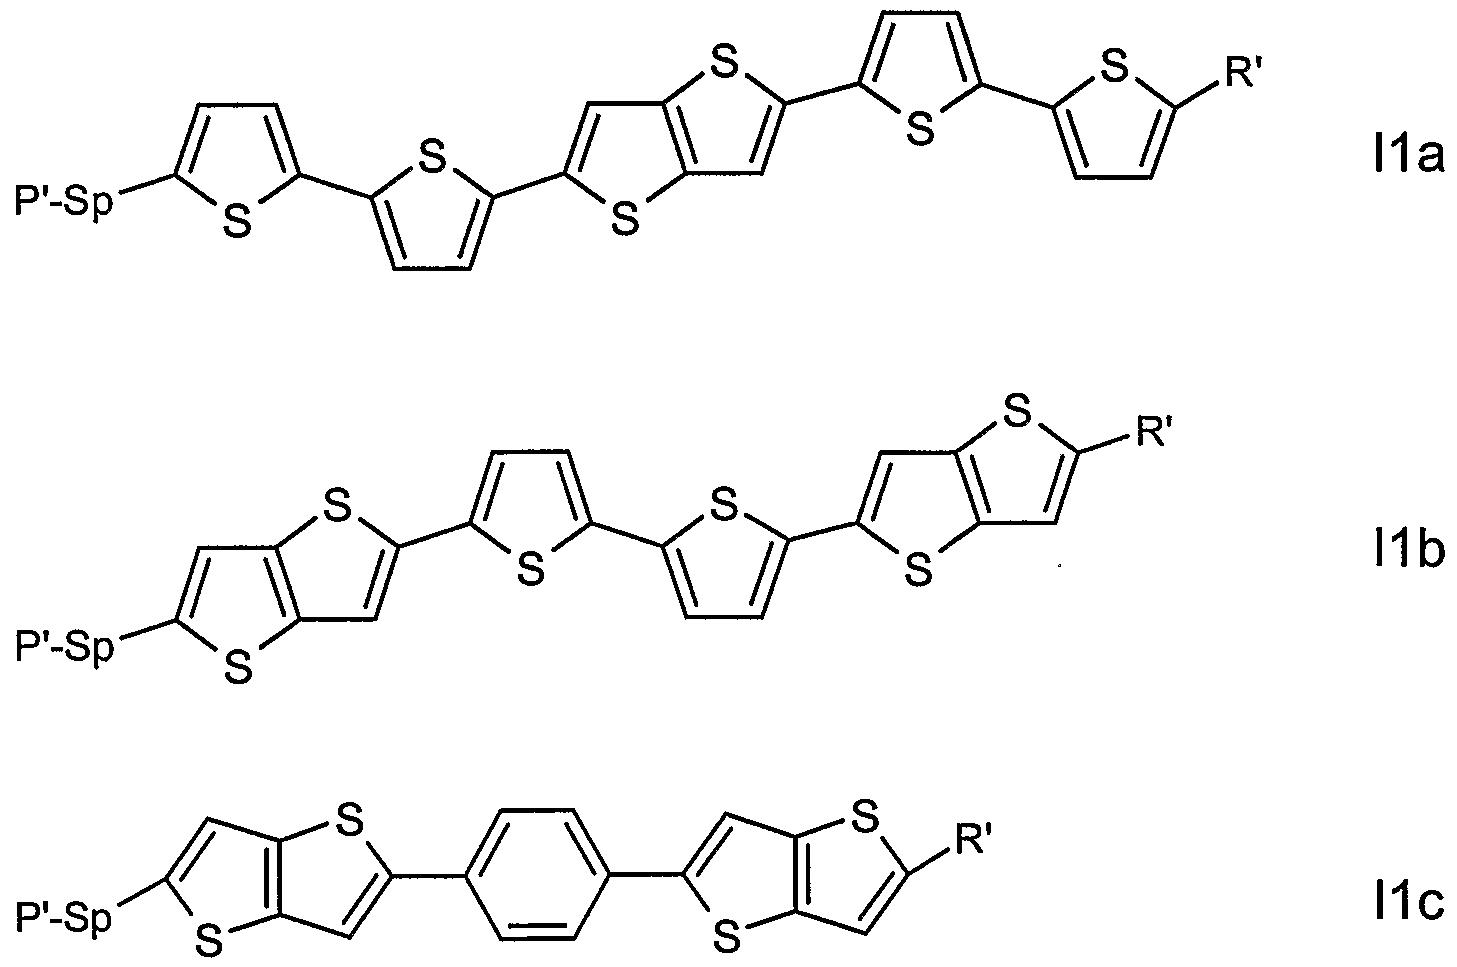 Xeo2f2 Lewis Structure Xeof4 lewis structureXeof4 Molecular Geometry